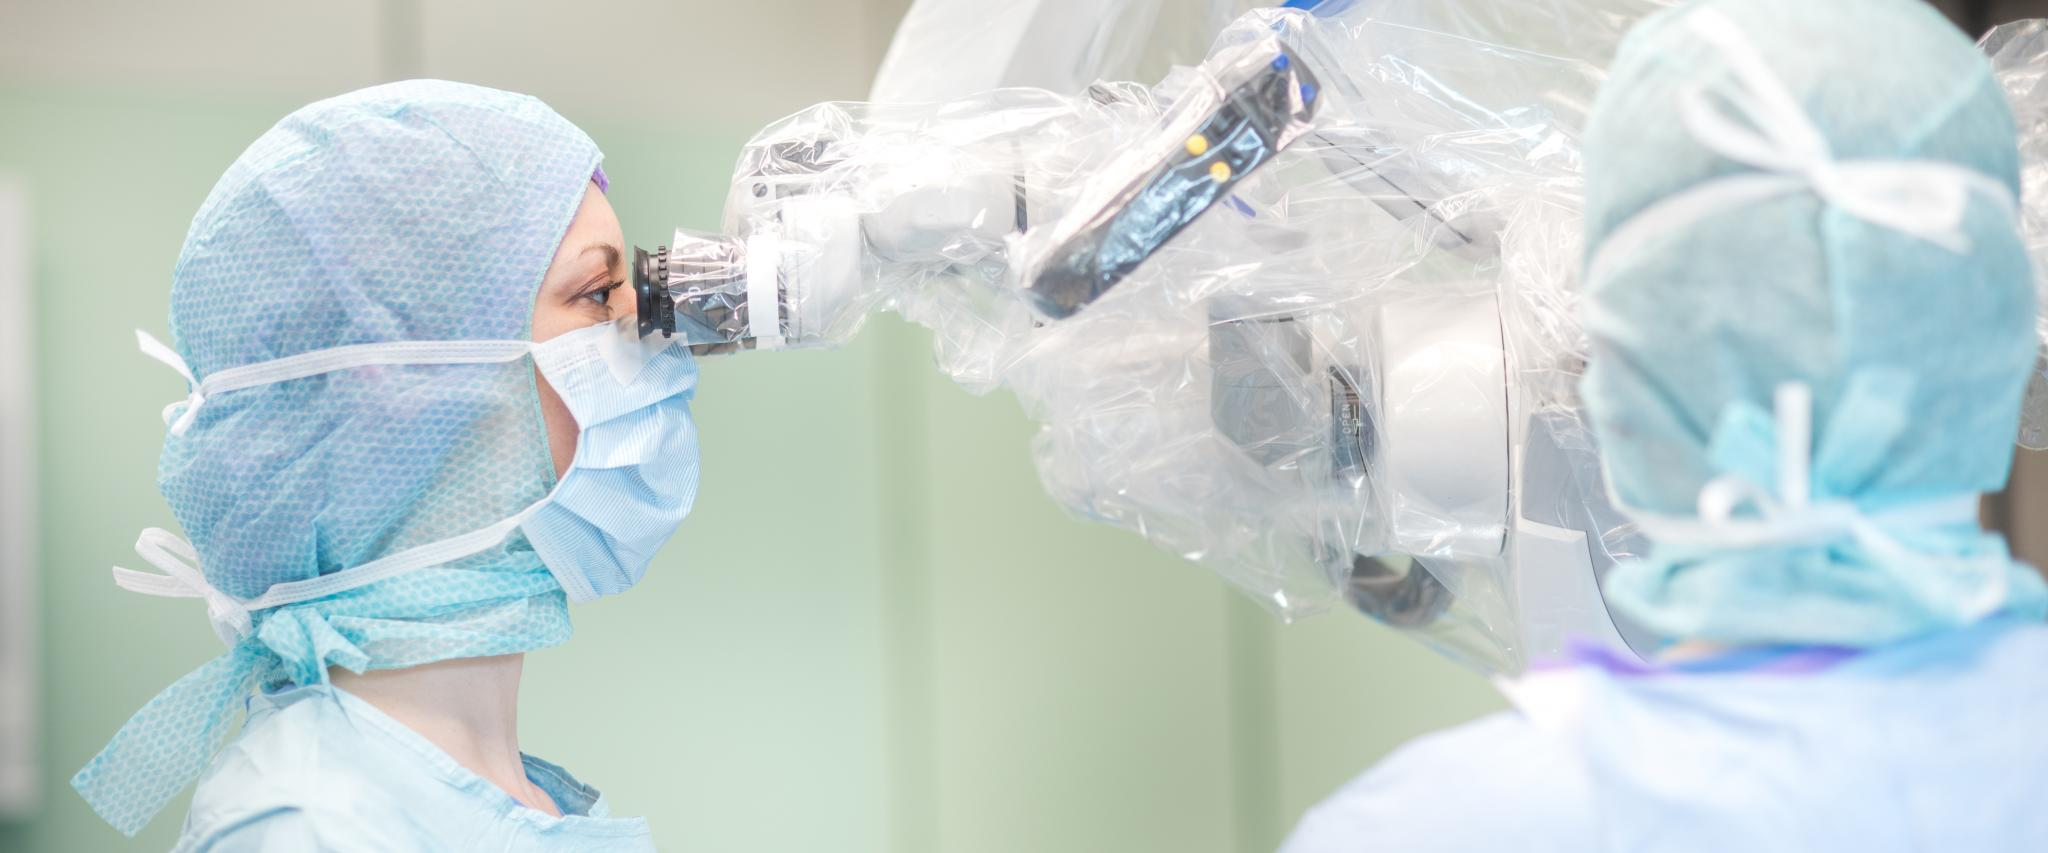 Klinik für Neurochirurgie | Kantonsspital Aarau